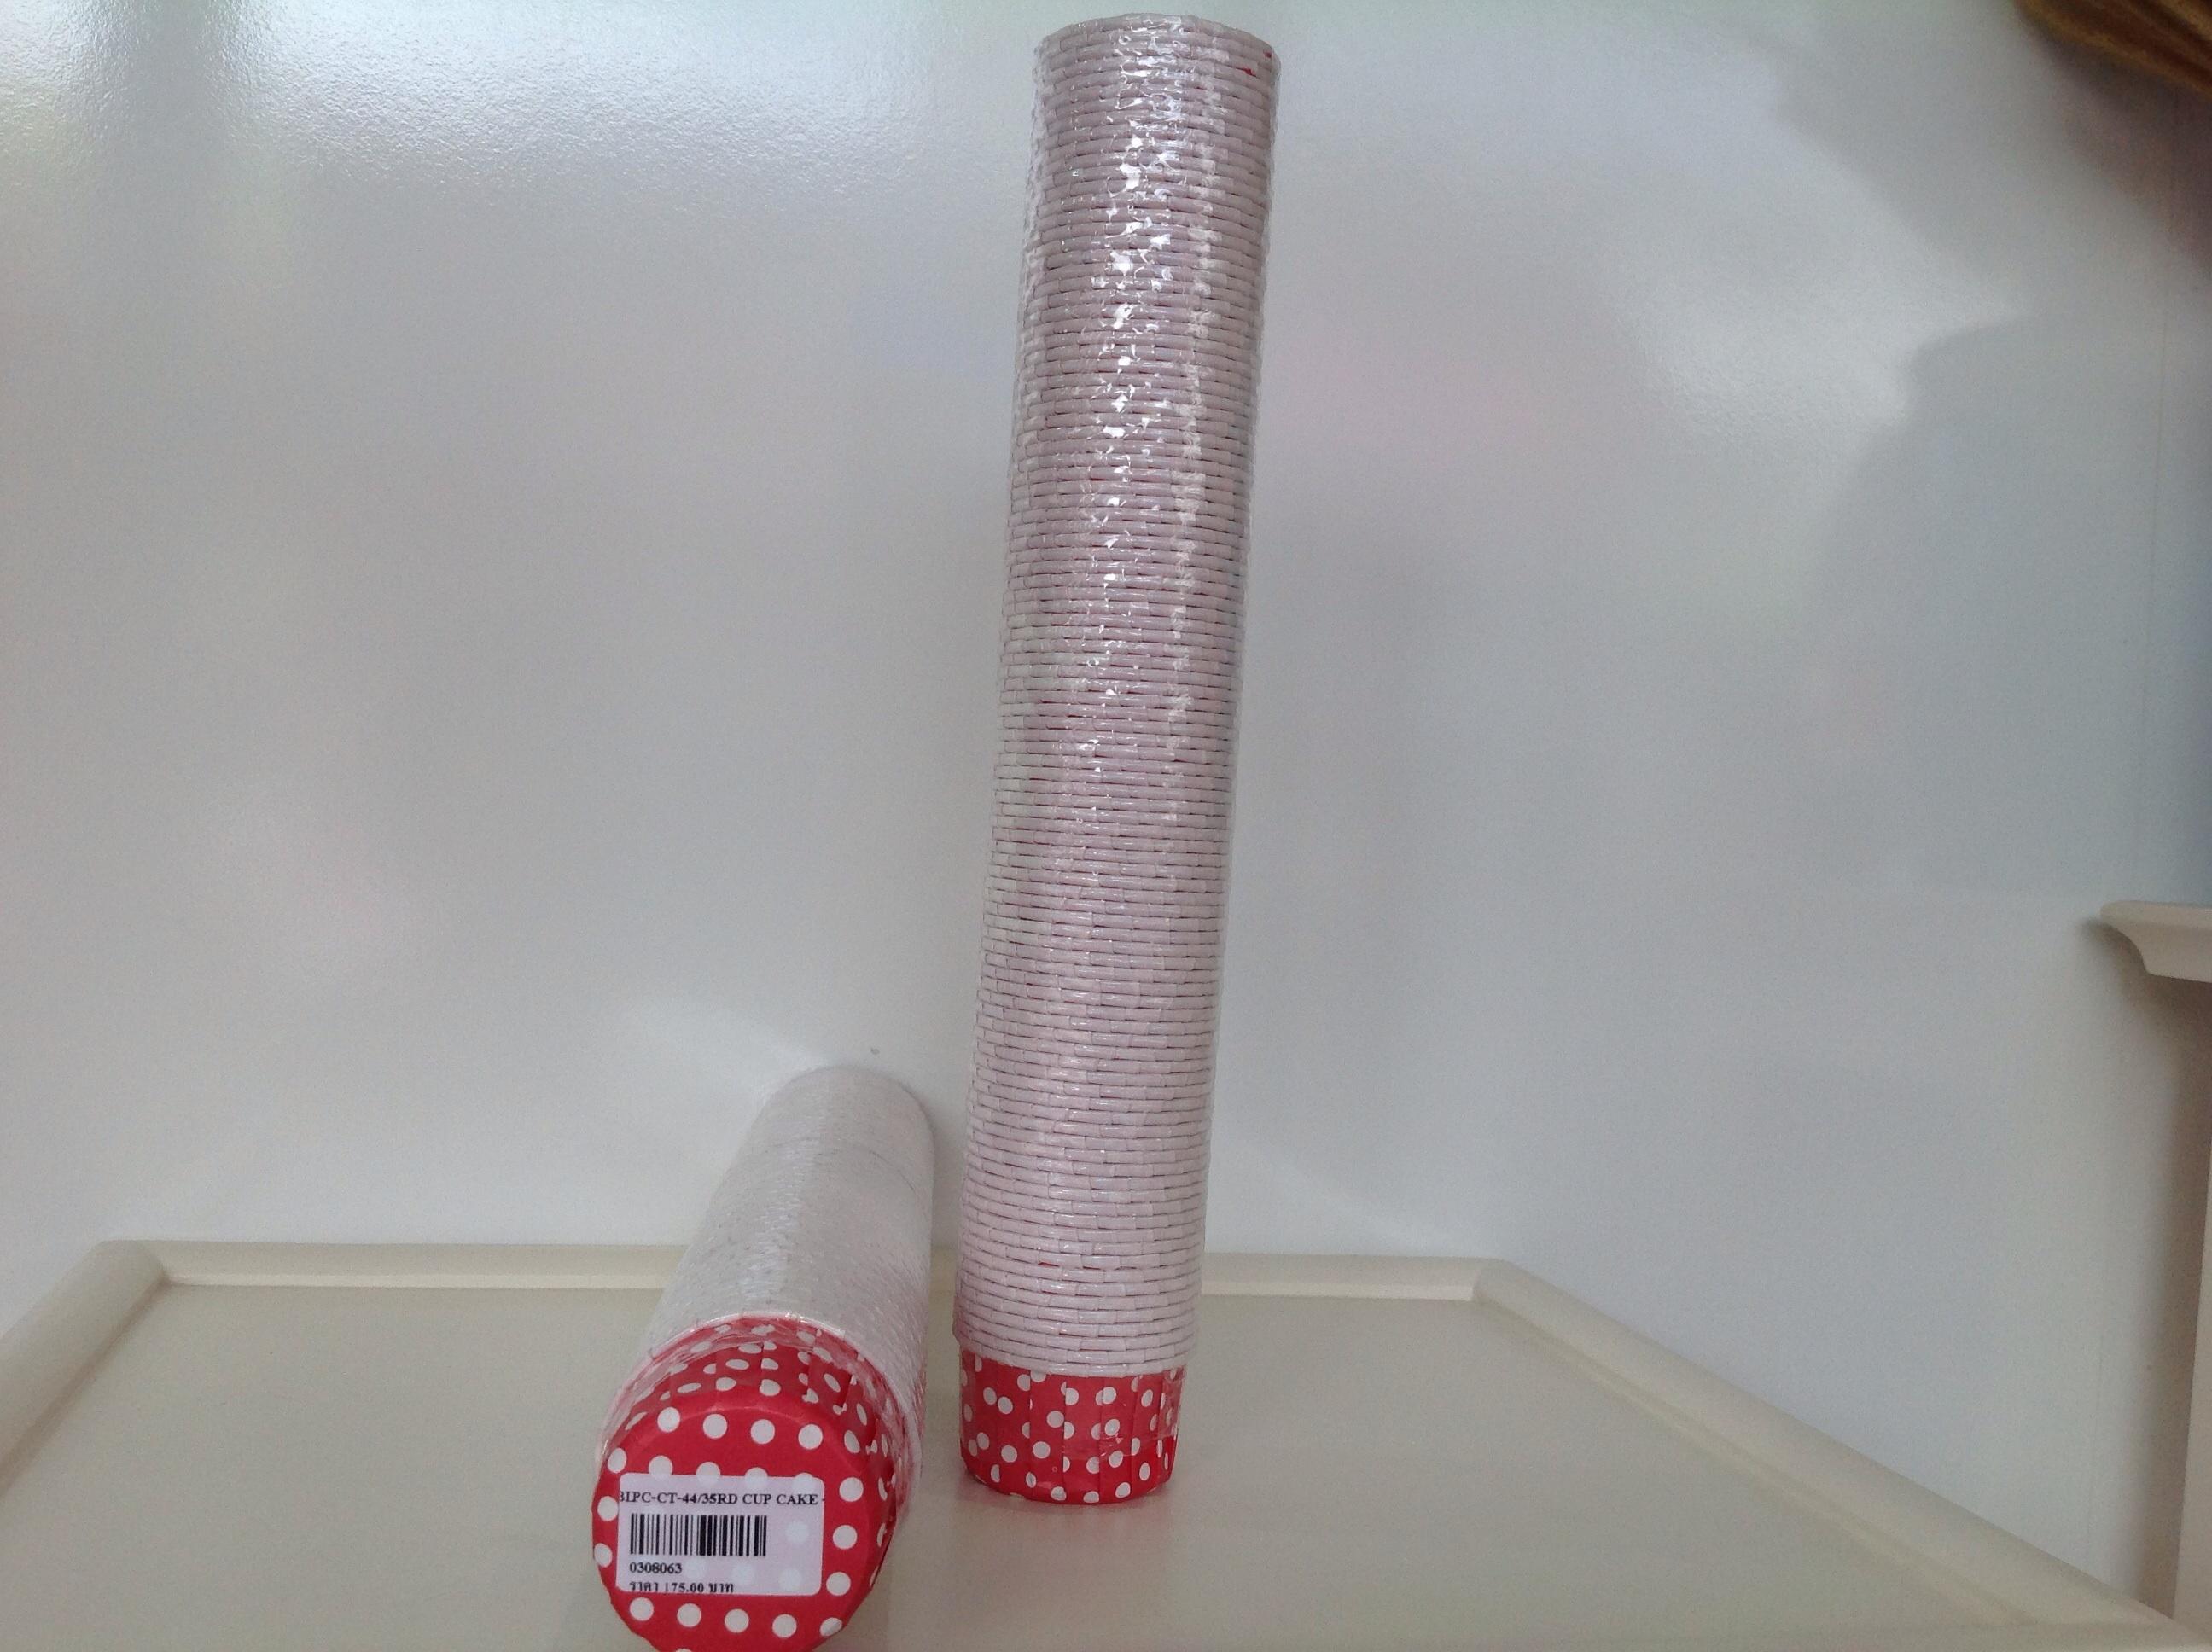 PC-CT-44/35RD Cup cake red dot (แดงจุด)